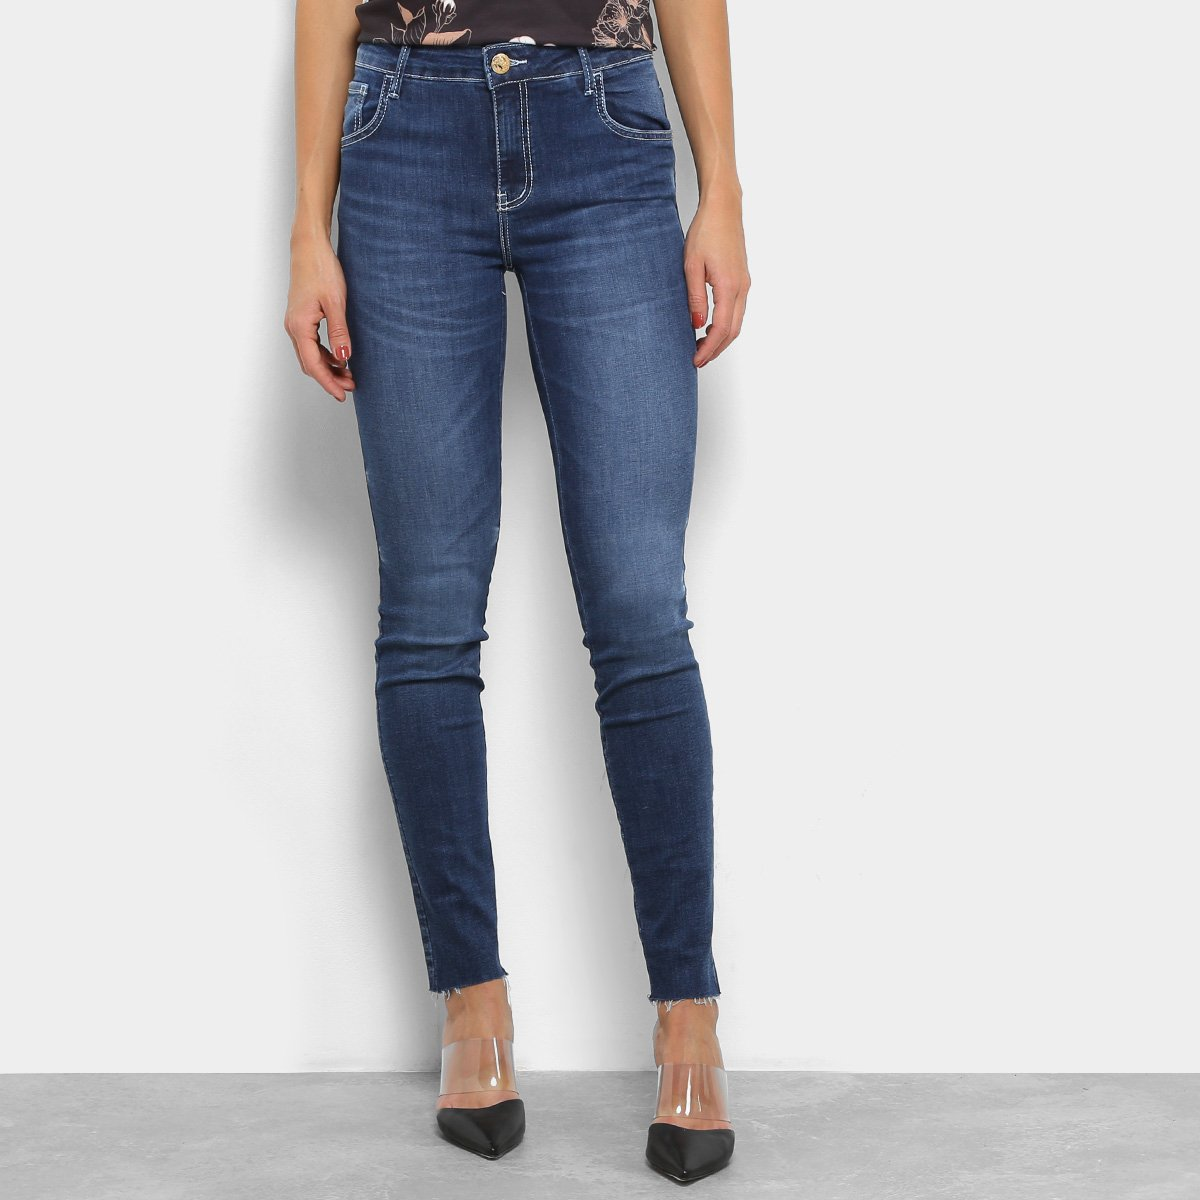 c4daabbc5 Calça Jeans Skinny Coca-Cola Estonada Cintura Alta Feminina